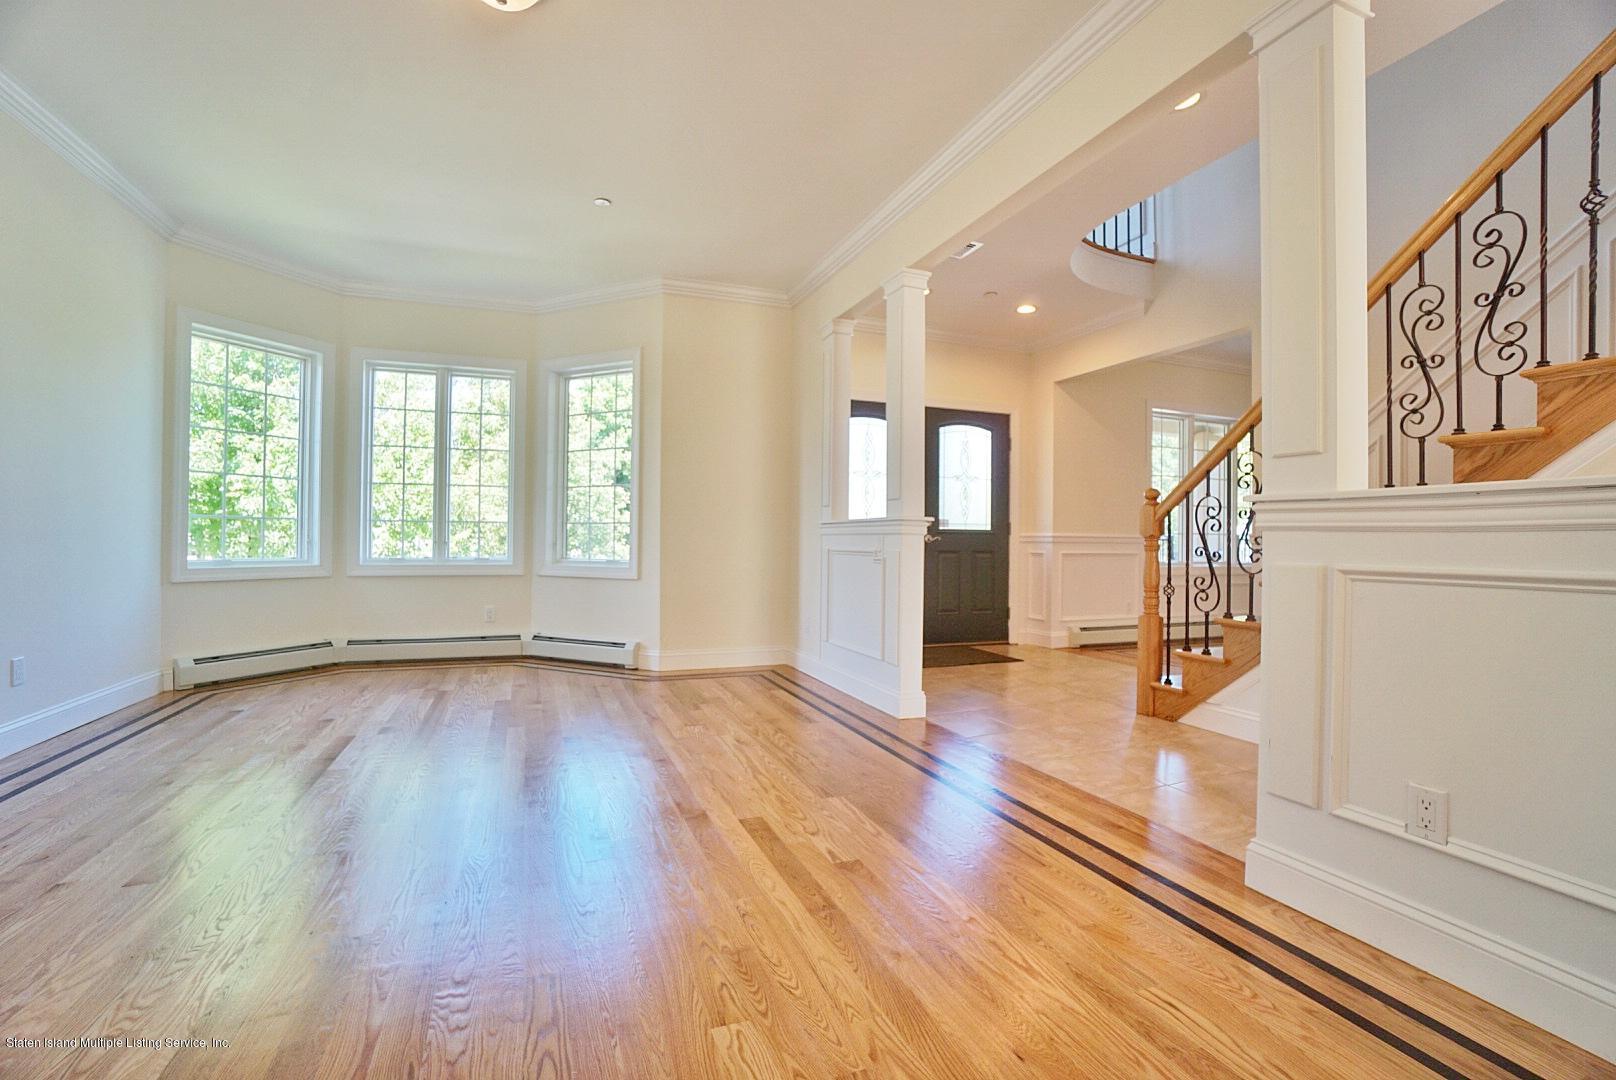 Single Family - Detached 678 Yetman Avenue  Staten Island, NY 10307, MLS-1132766-11